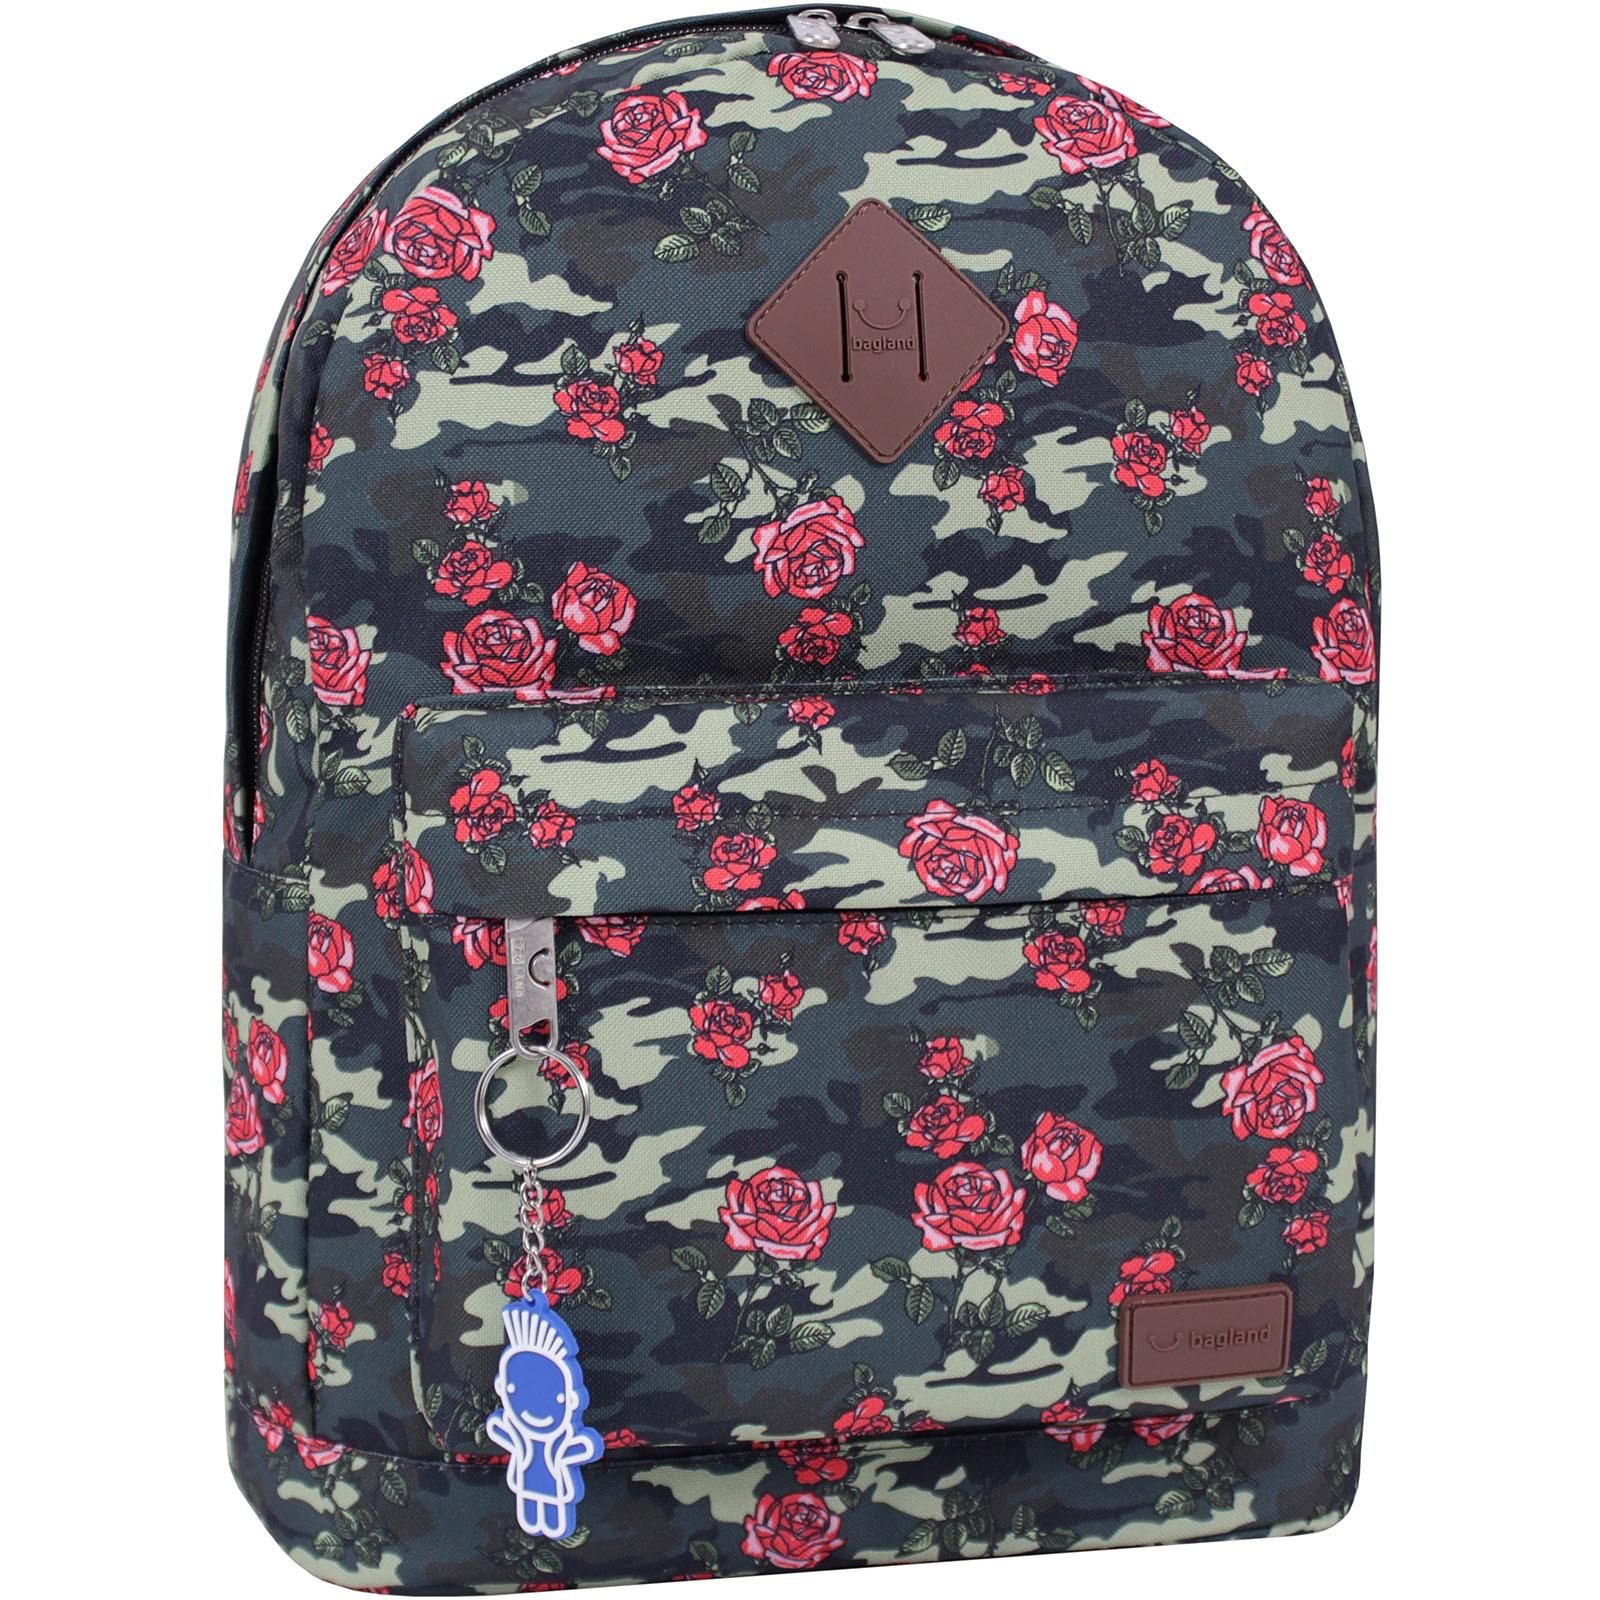 Молодежные рюкзаки Рюкзак Bagland Молодежный 17 л. сублимация 470 (00533664) IMG_9517_суб.470_.JPG